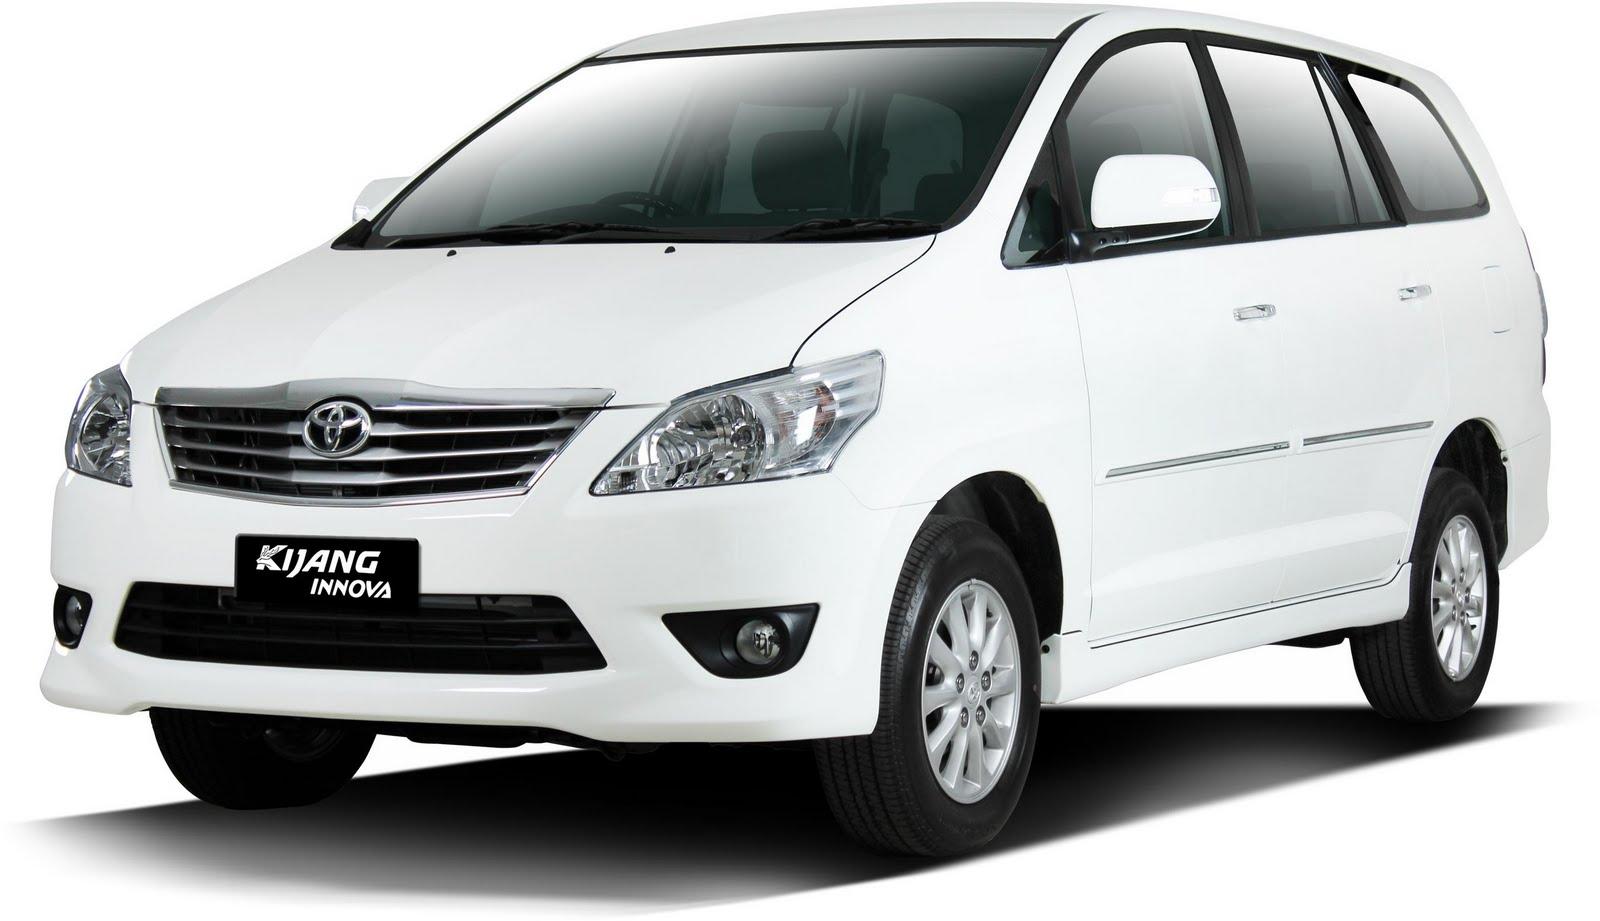 Rental Mobil Purwokerto - Kijang Inova